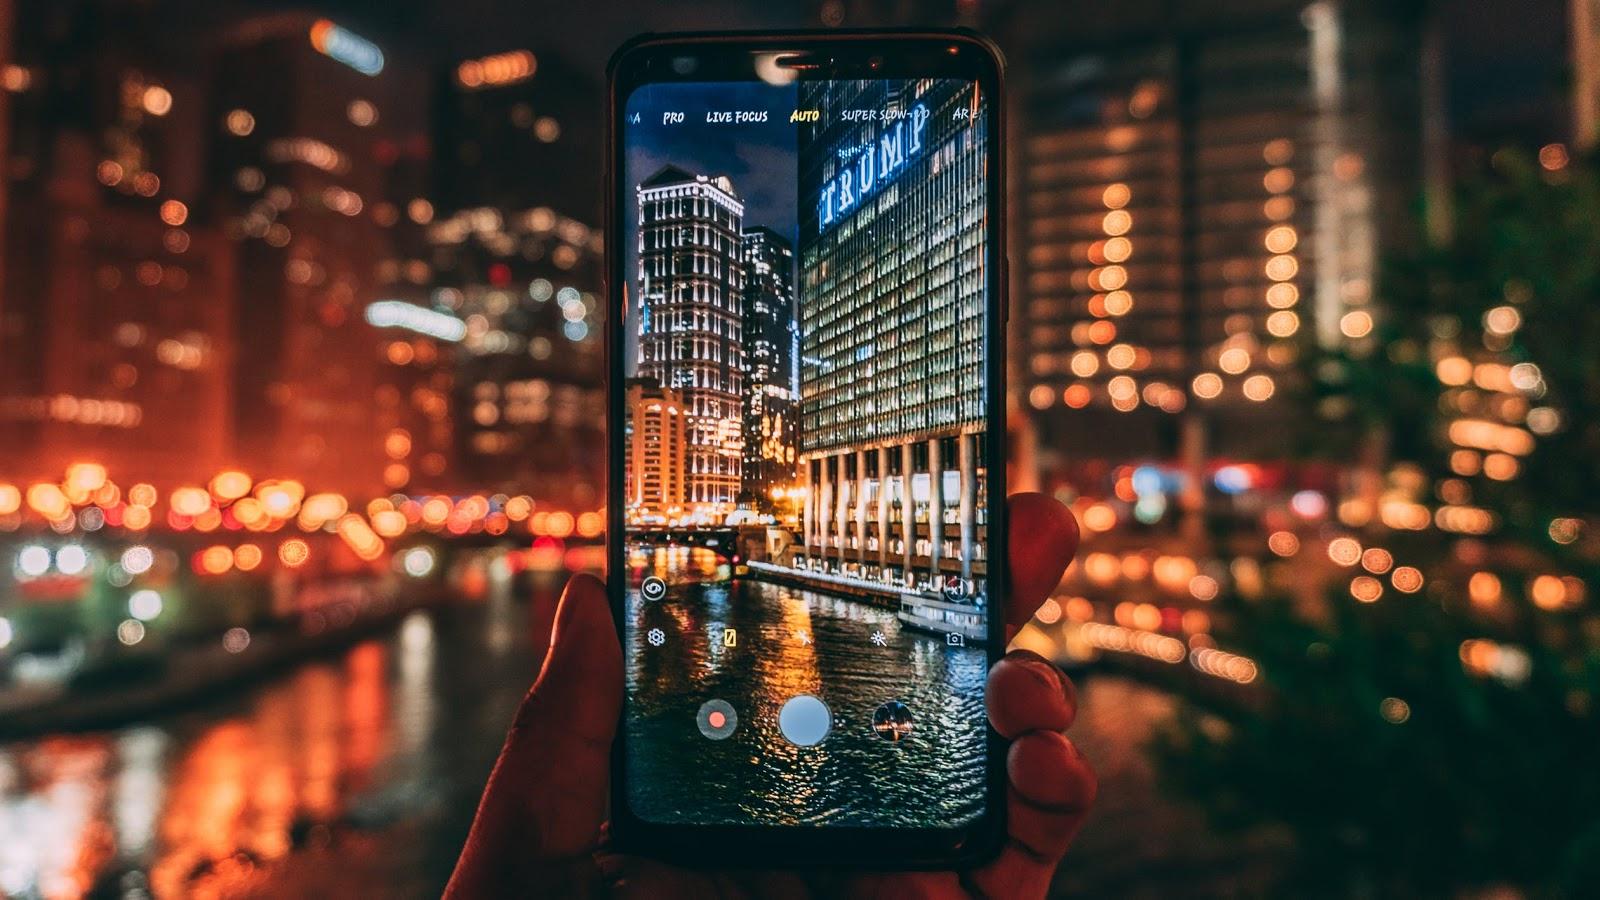 Phone Taking a Photo